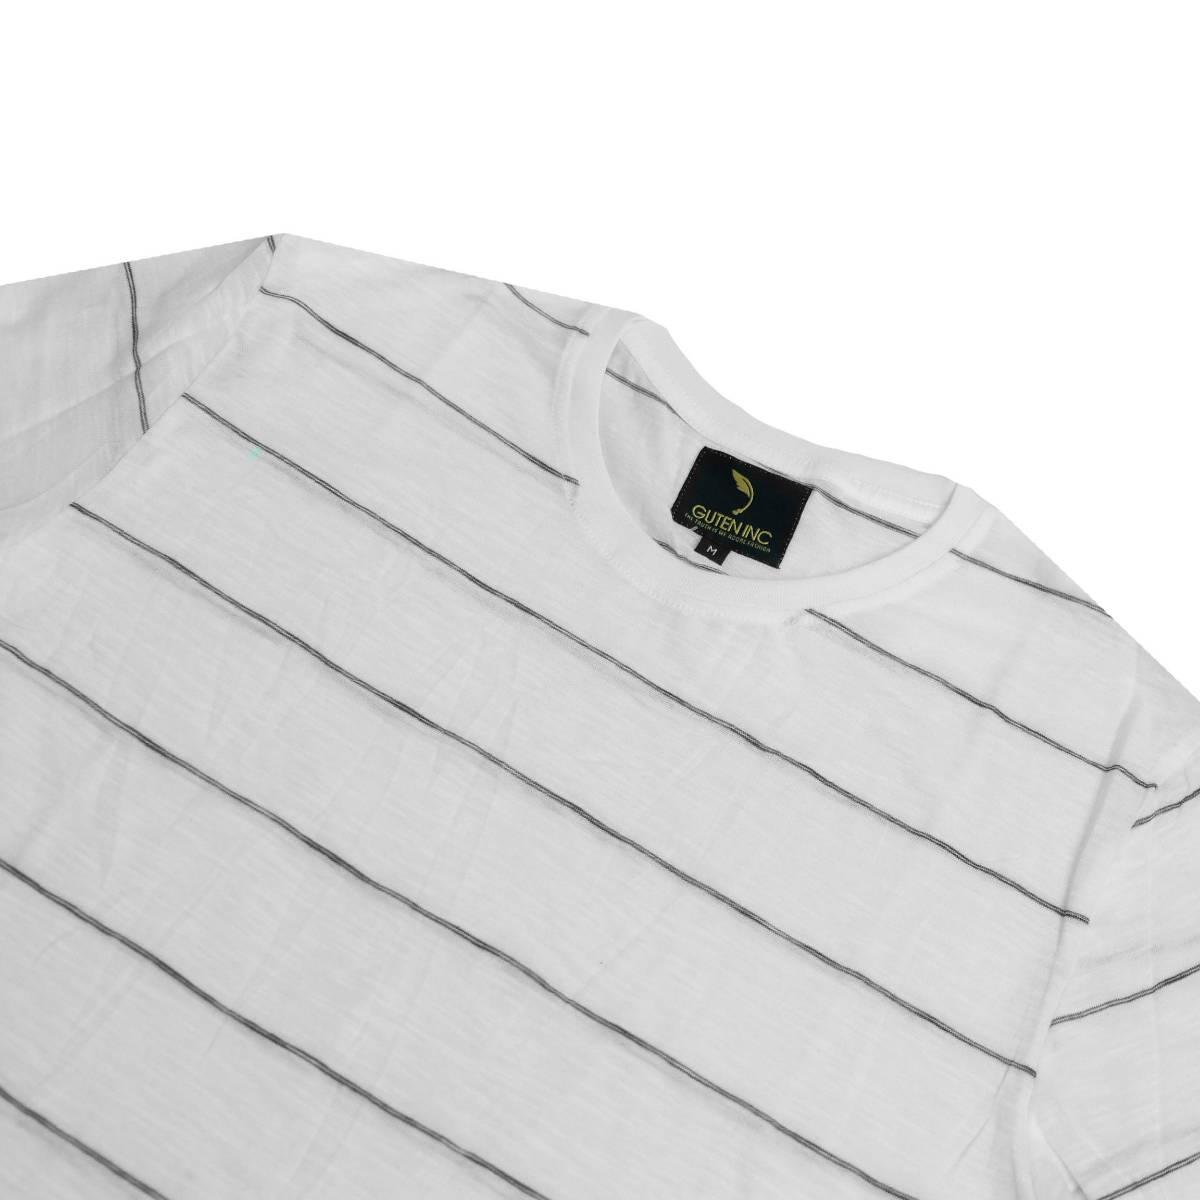 Kaos Lengan Panjang Chester White Thin Stripe Ls Sentral Online Polos Big Black Ls3